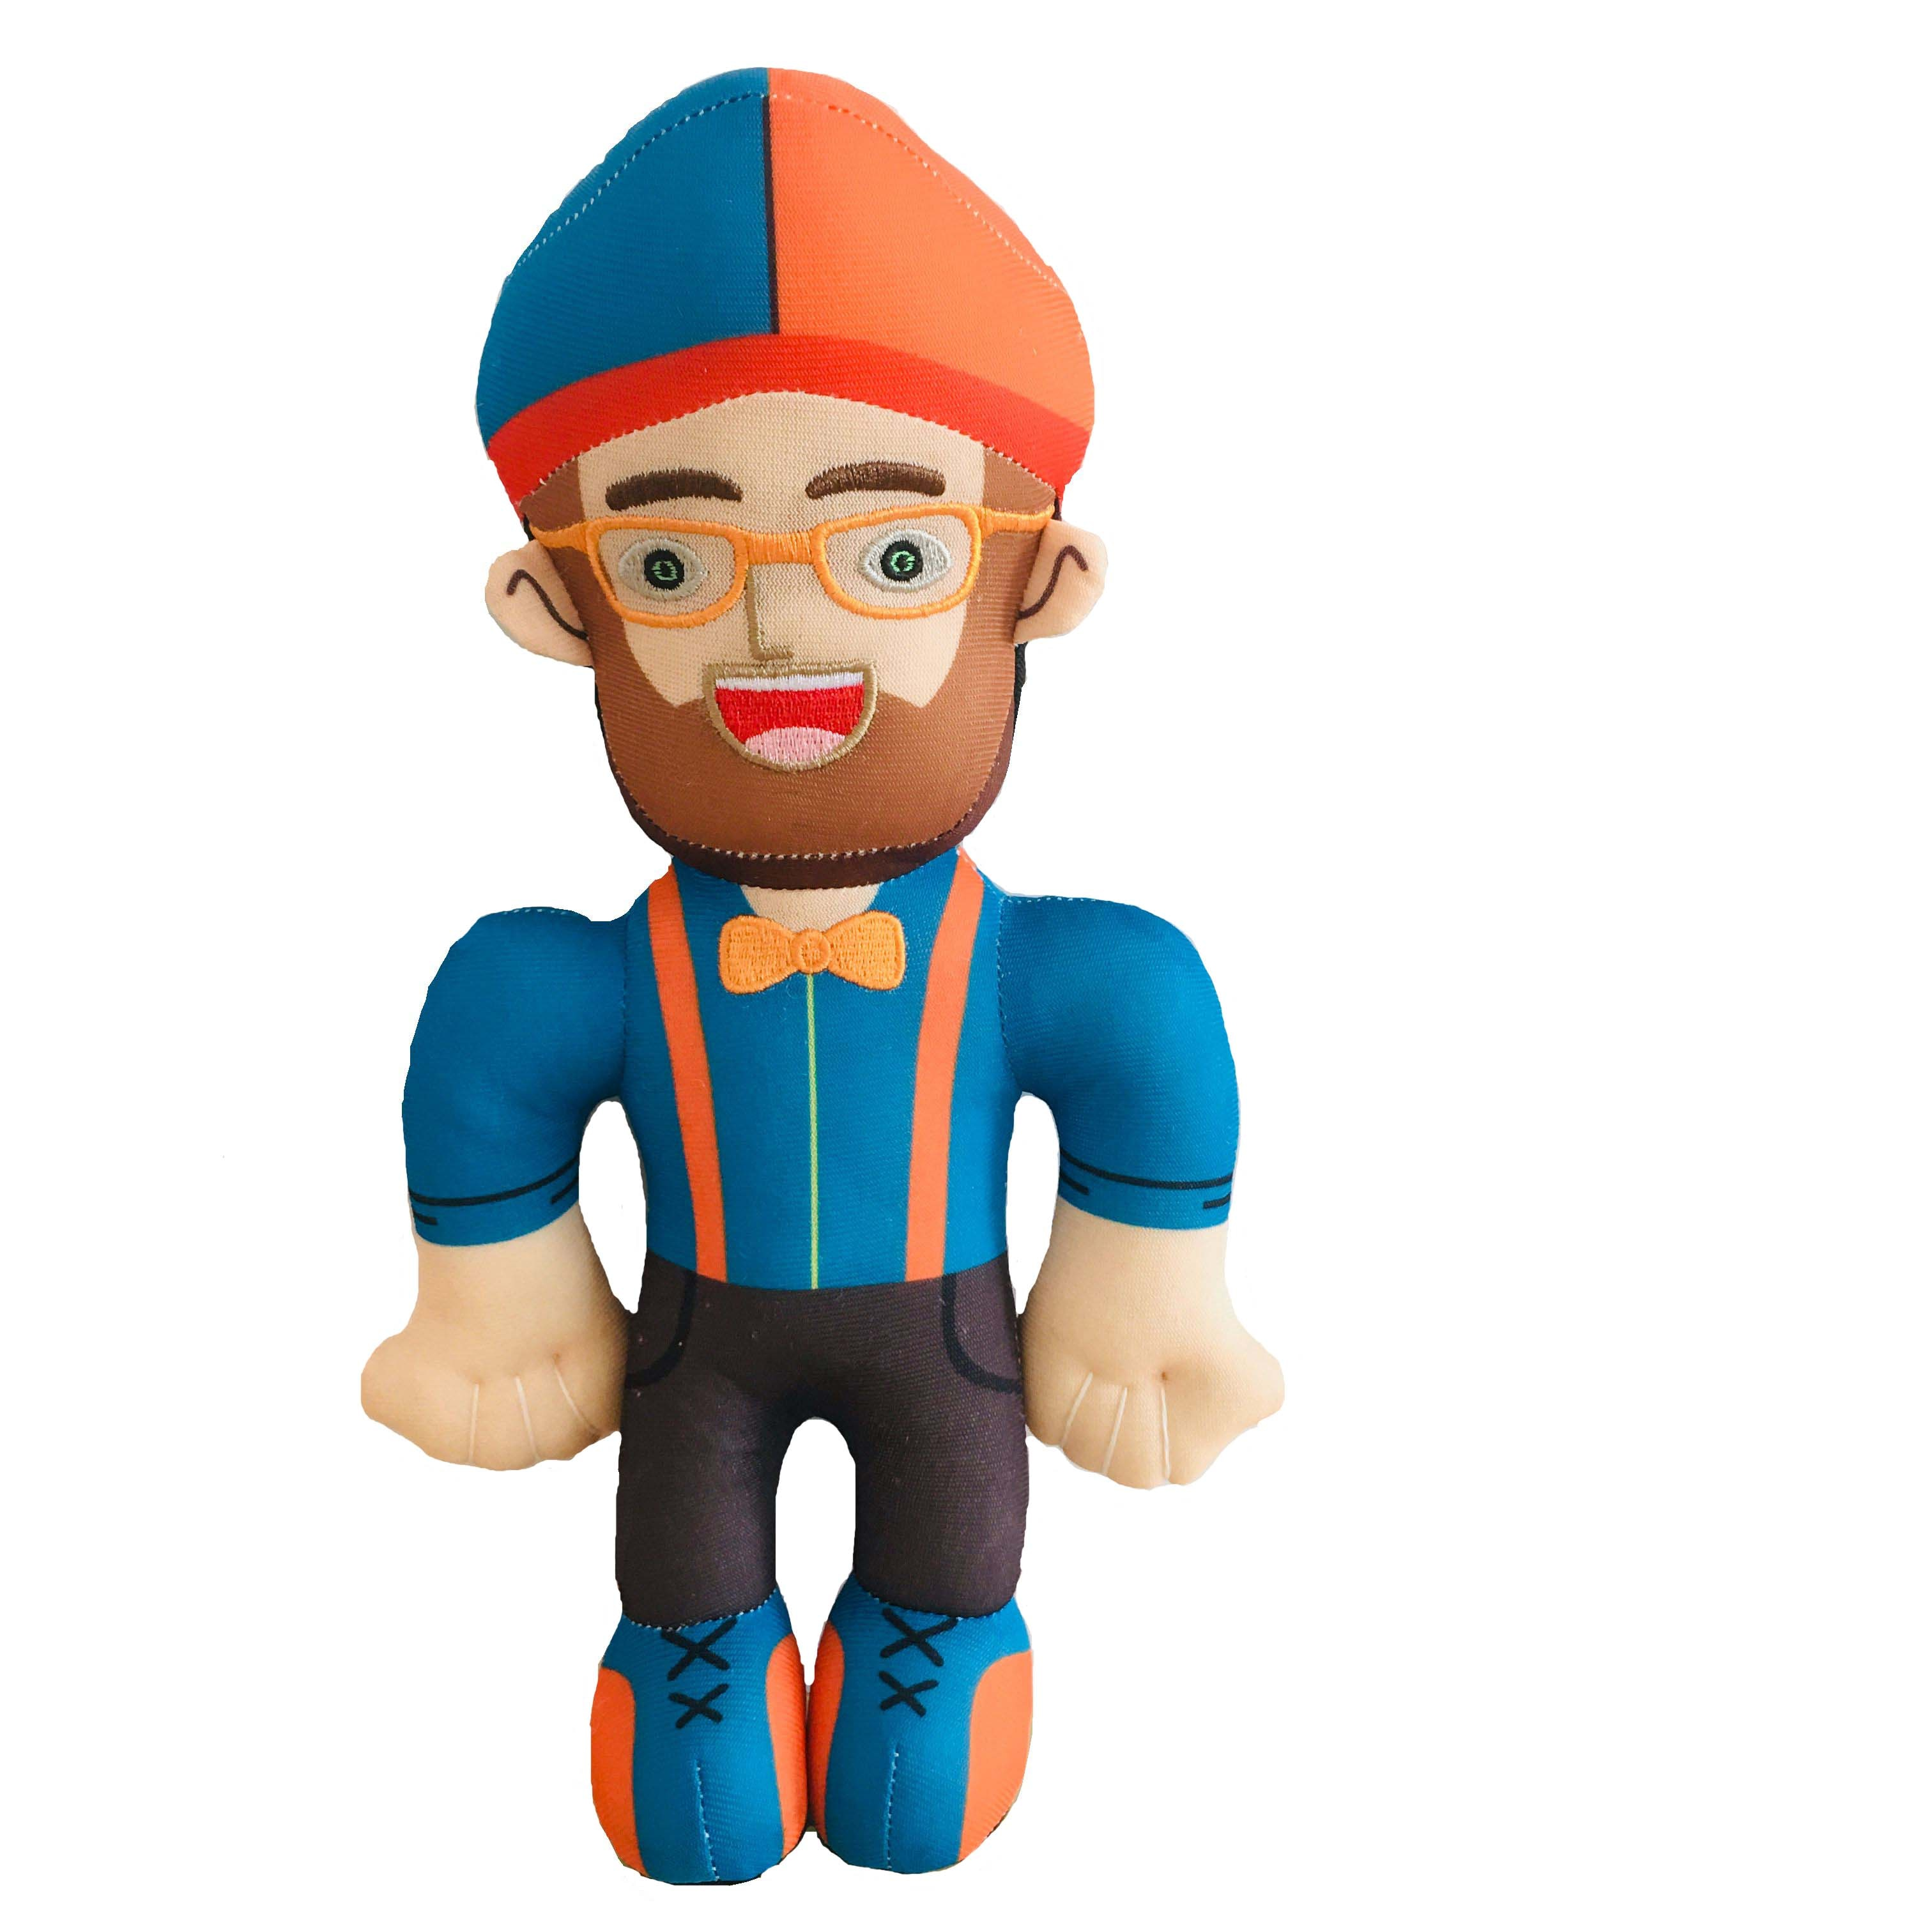 Muñeca de peluche Blippi de 30cm